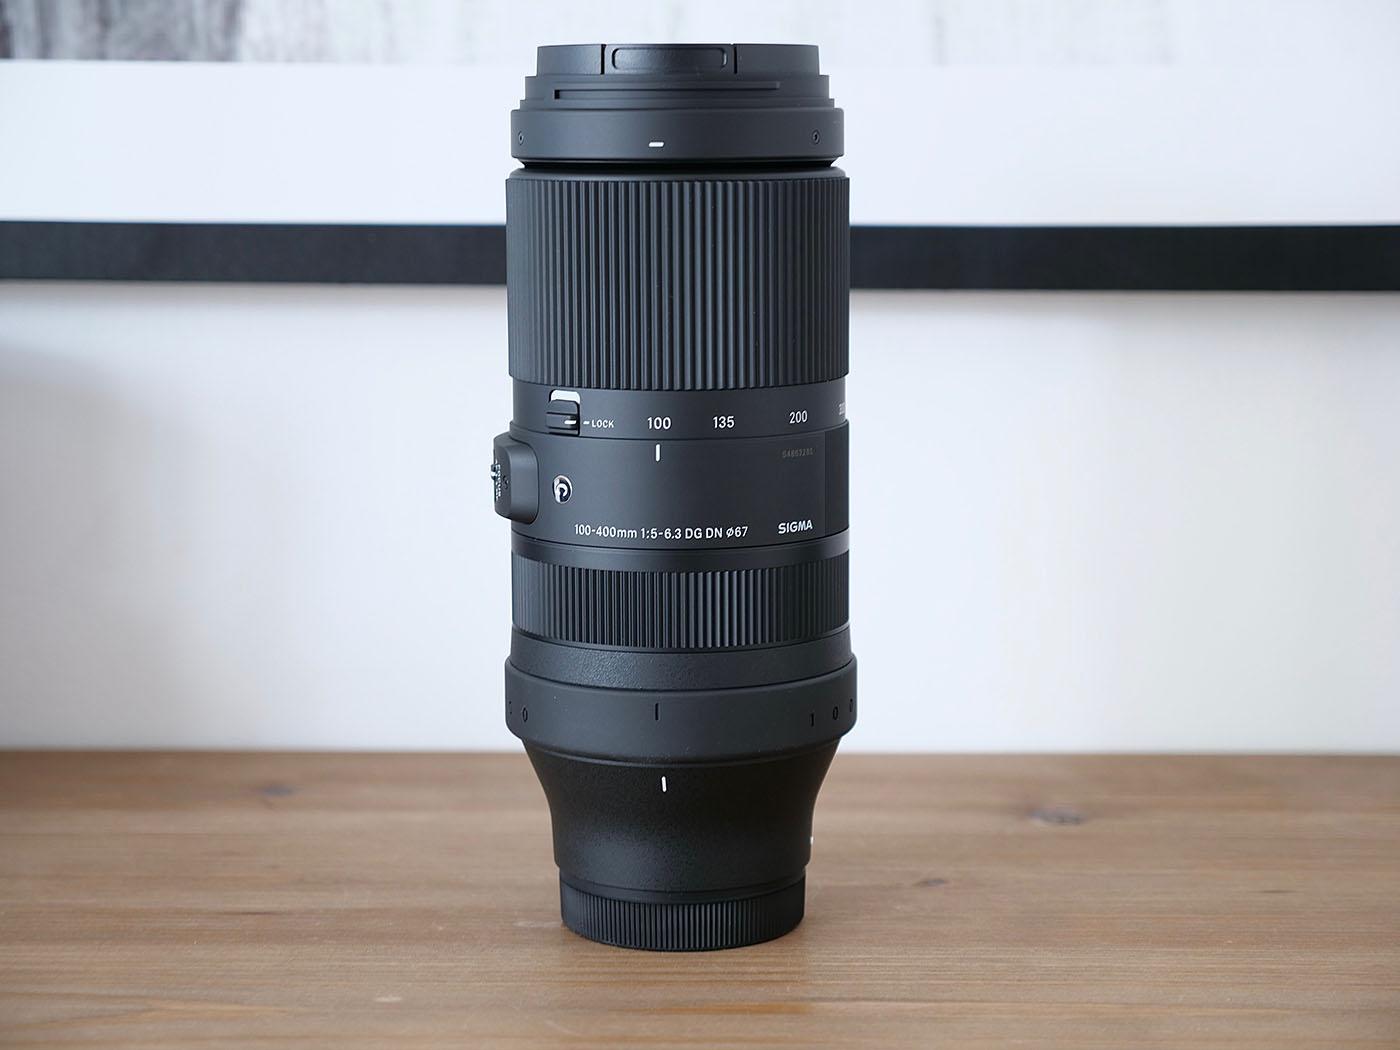 objectif plein format Sigma monture L zoom